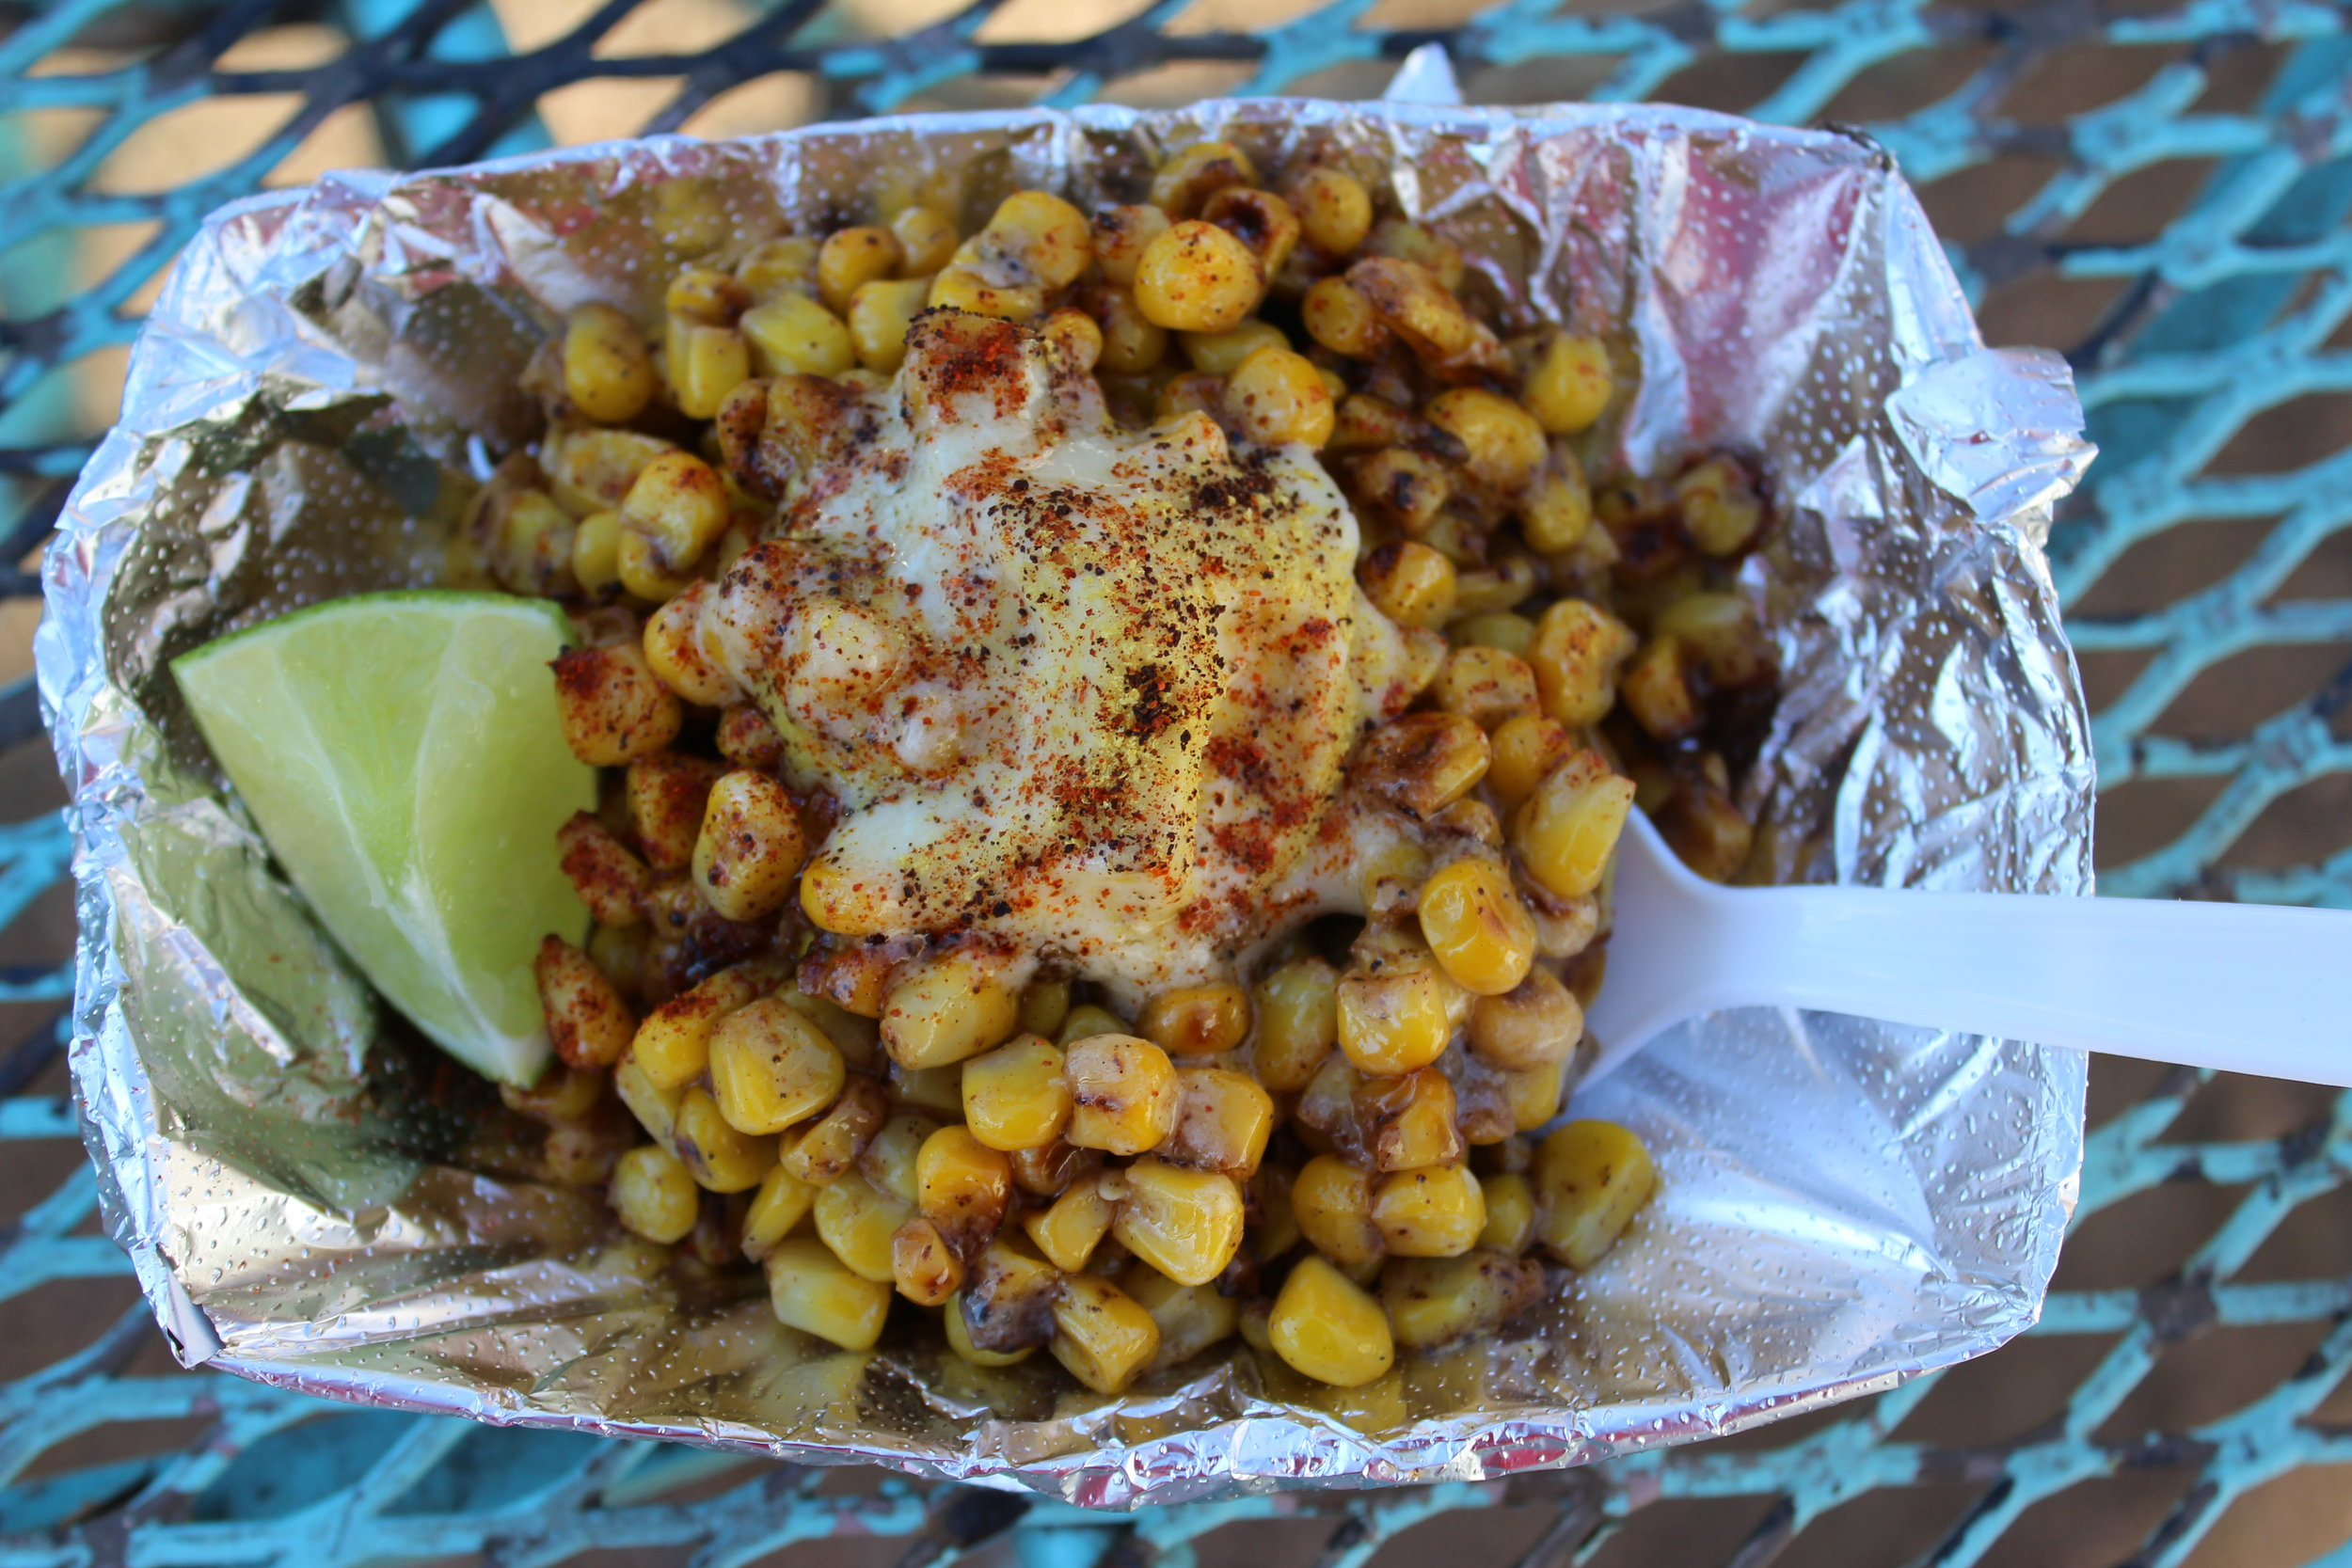 Cool Beans Taco Truck Street Corn.JPG